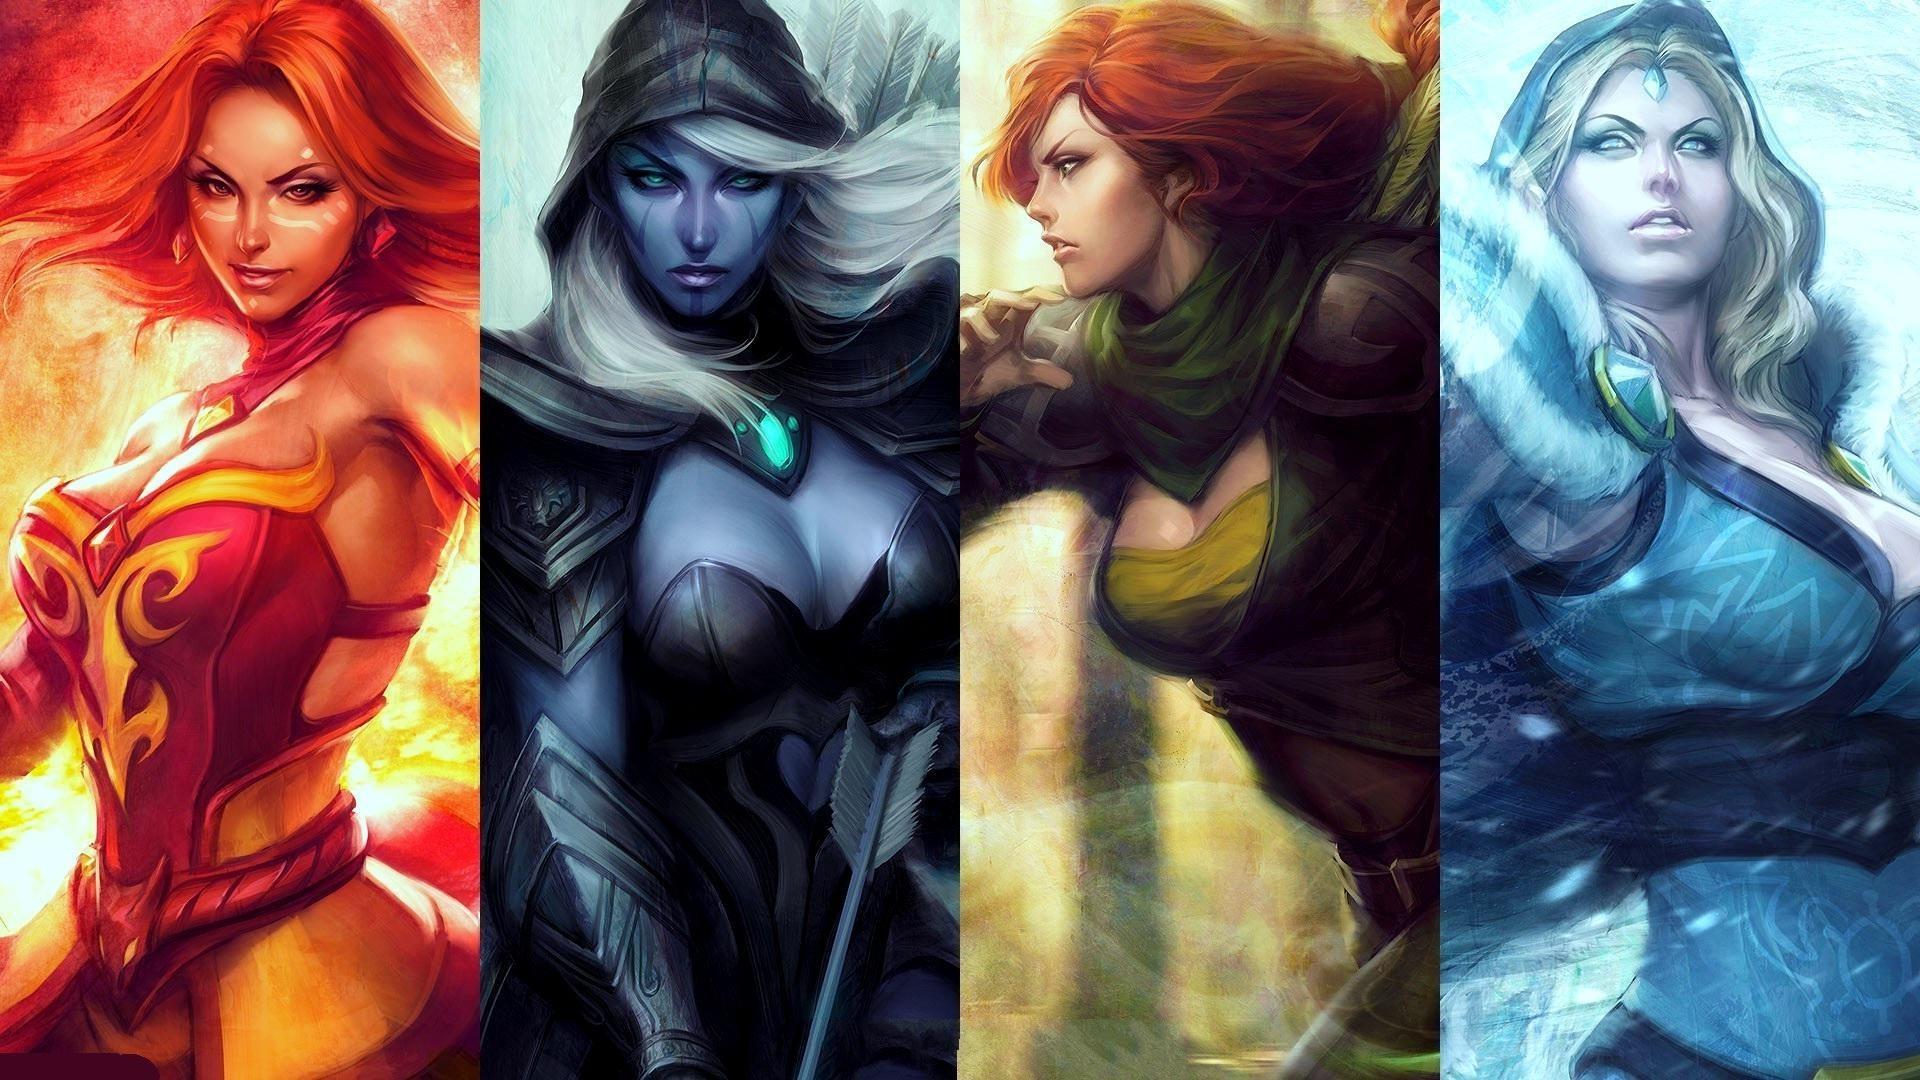 Дота женские персонажи картинки